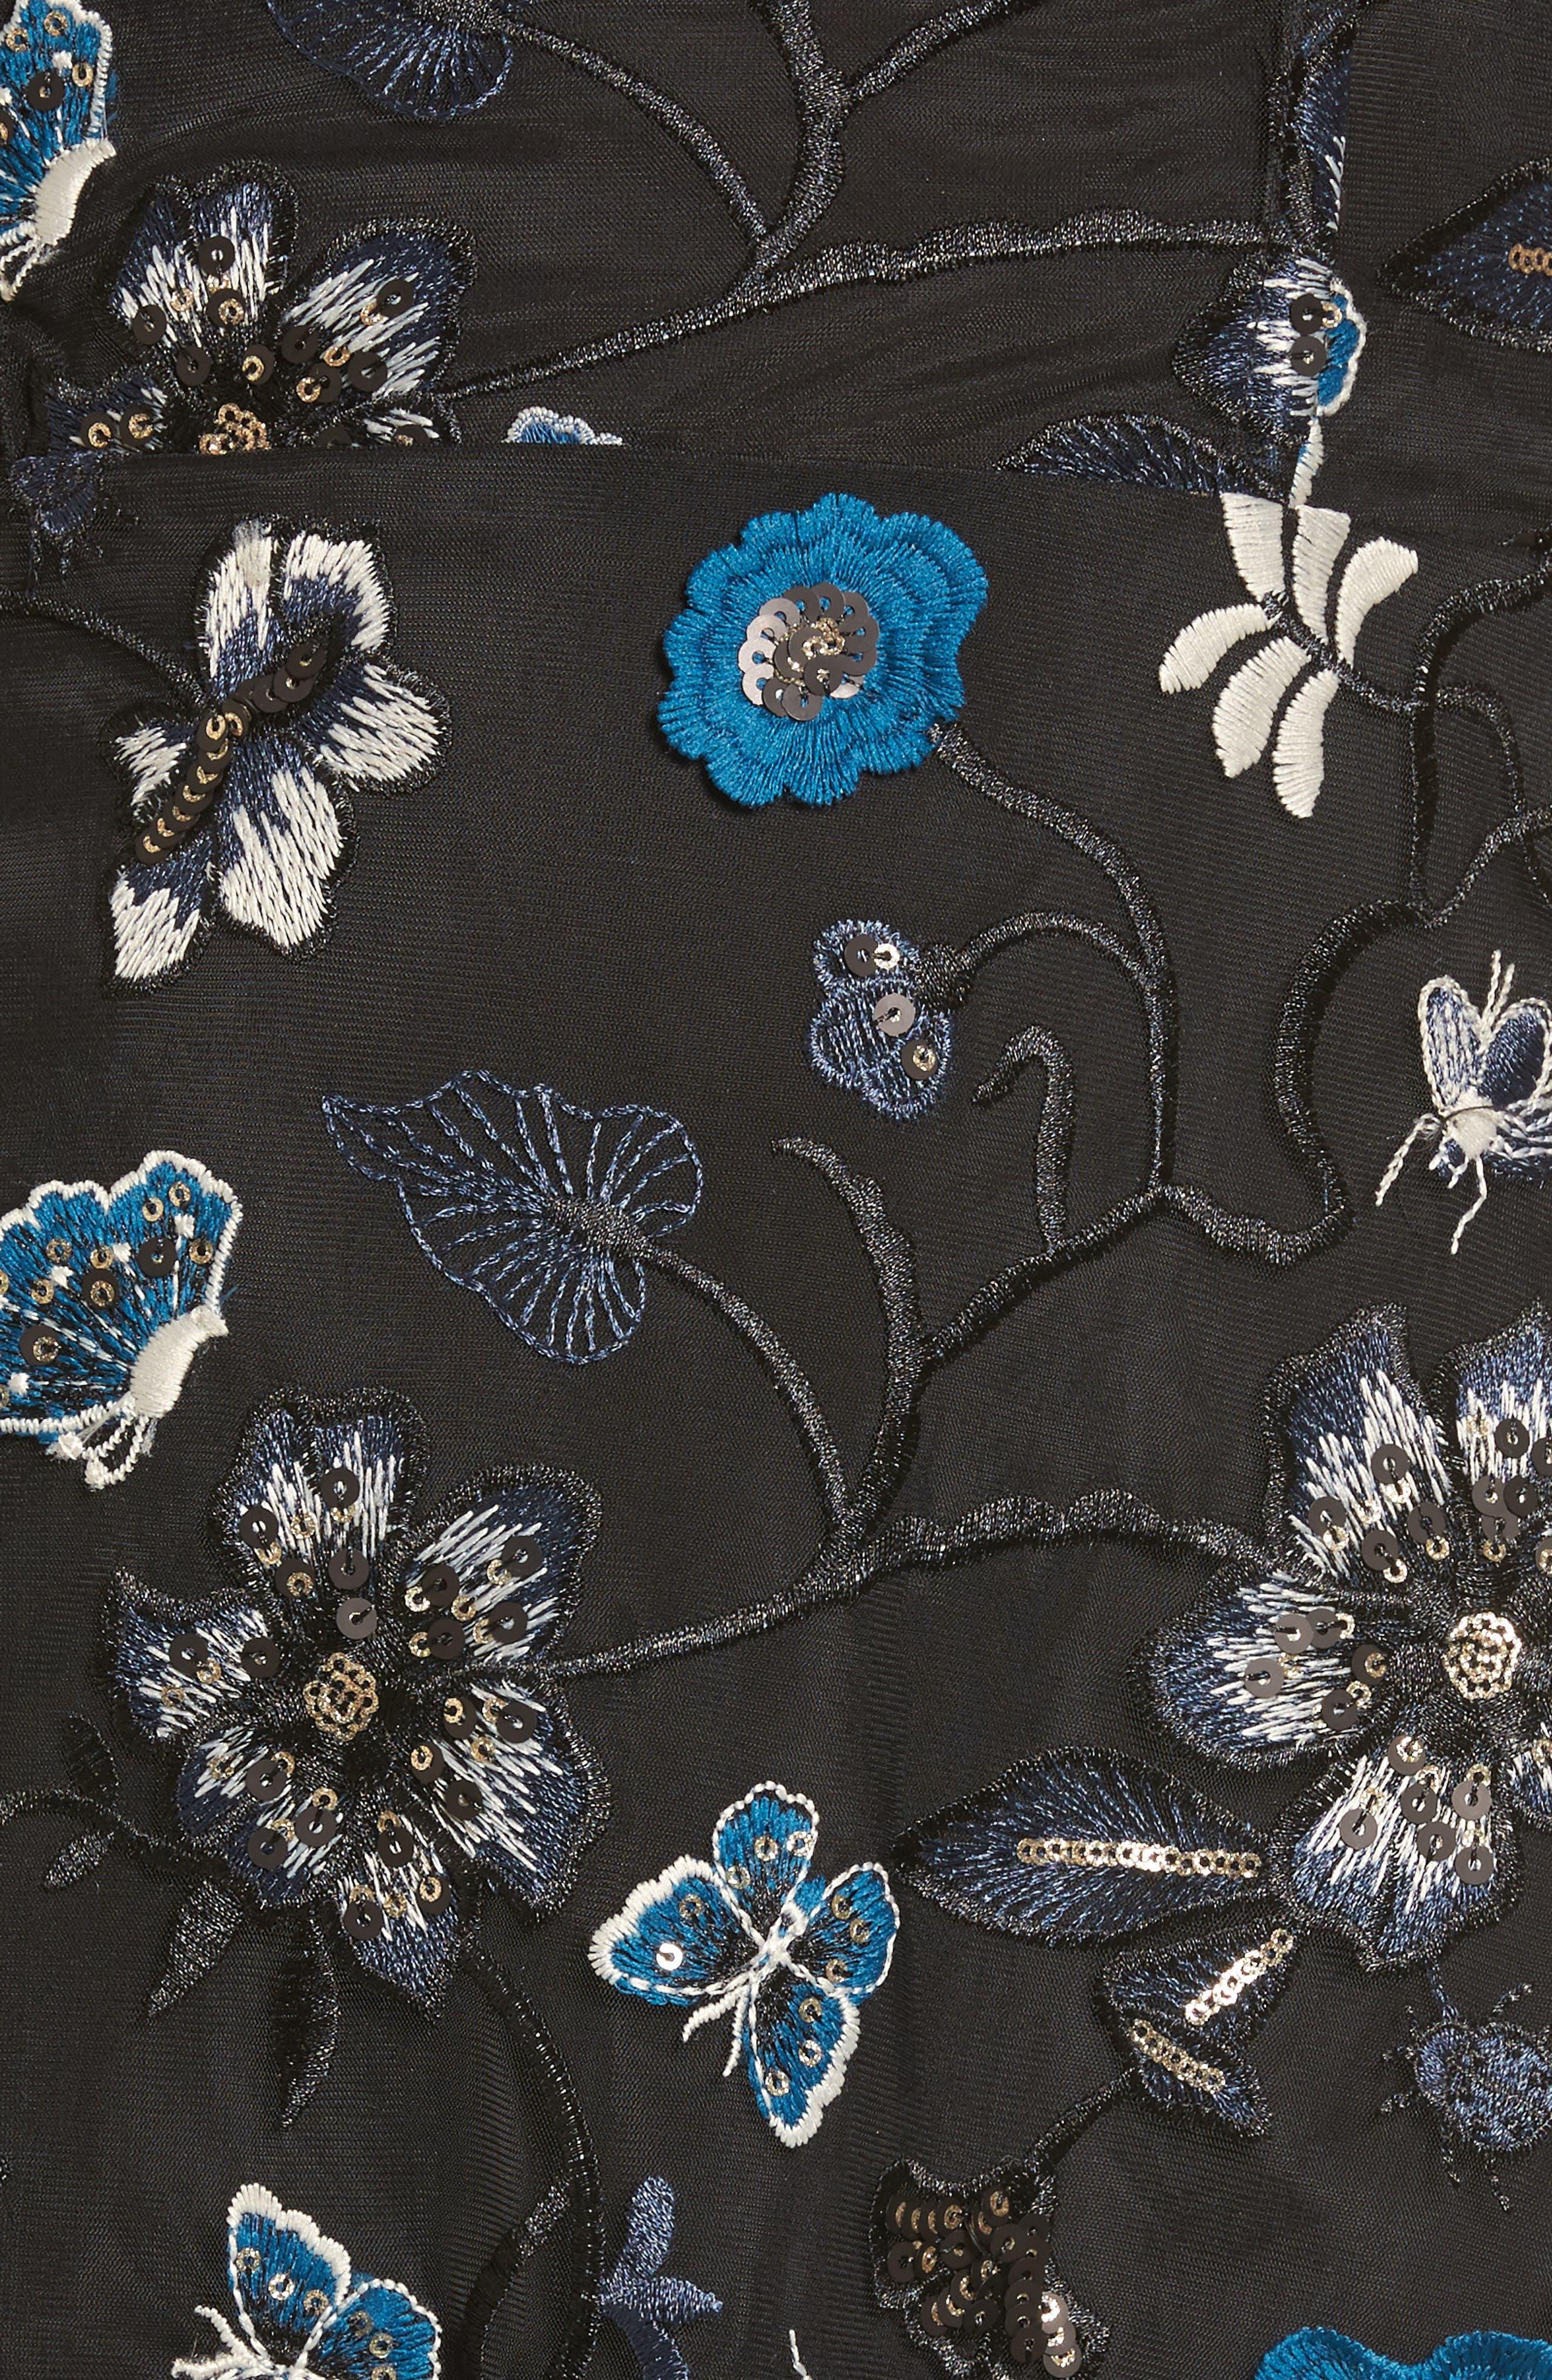 Bontanic Off the Shoulder Dress,                             Alternate thumbnail 5, color,                             Black Floral